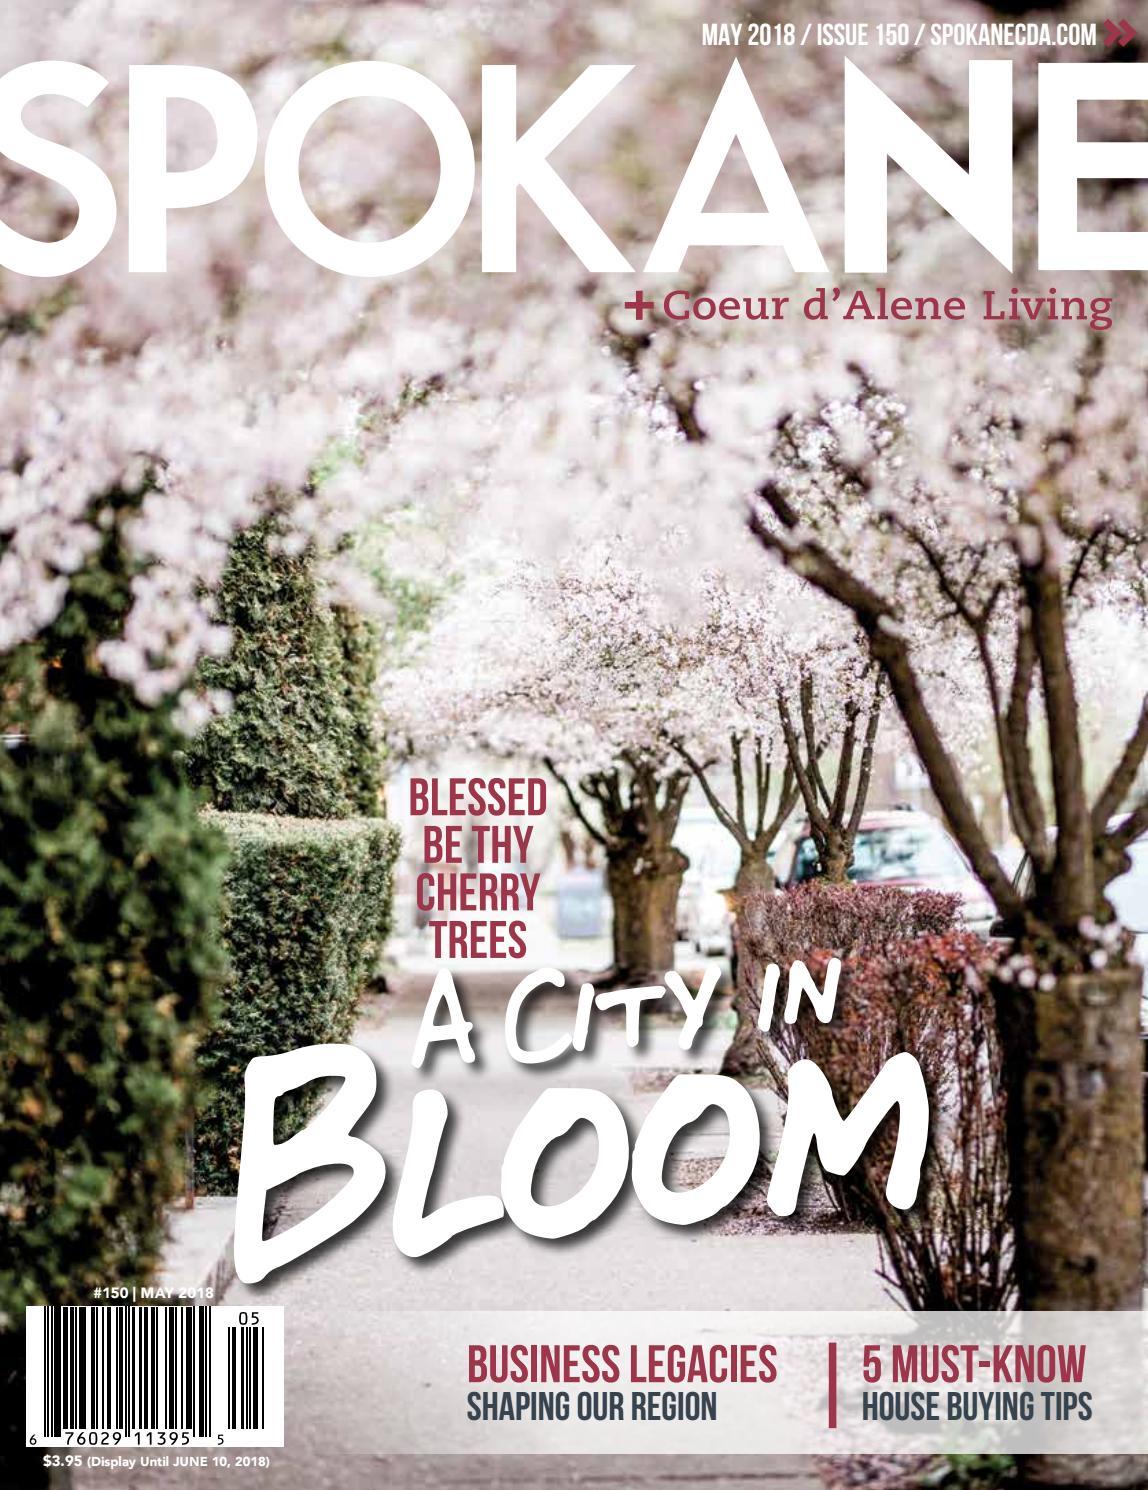 cc475c8af8f Spokane CDA Living May 2018  150 by Spokane magazine - issuu